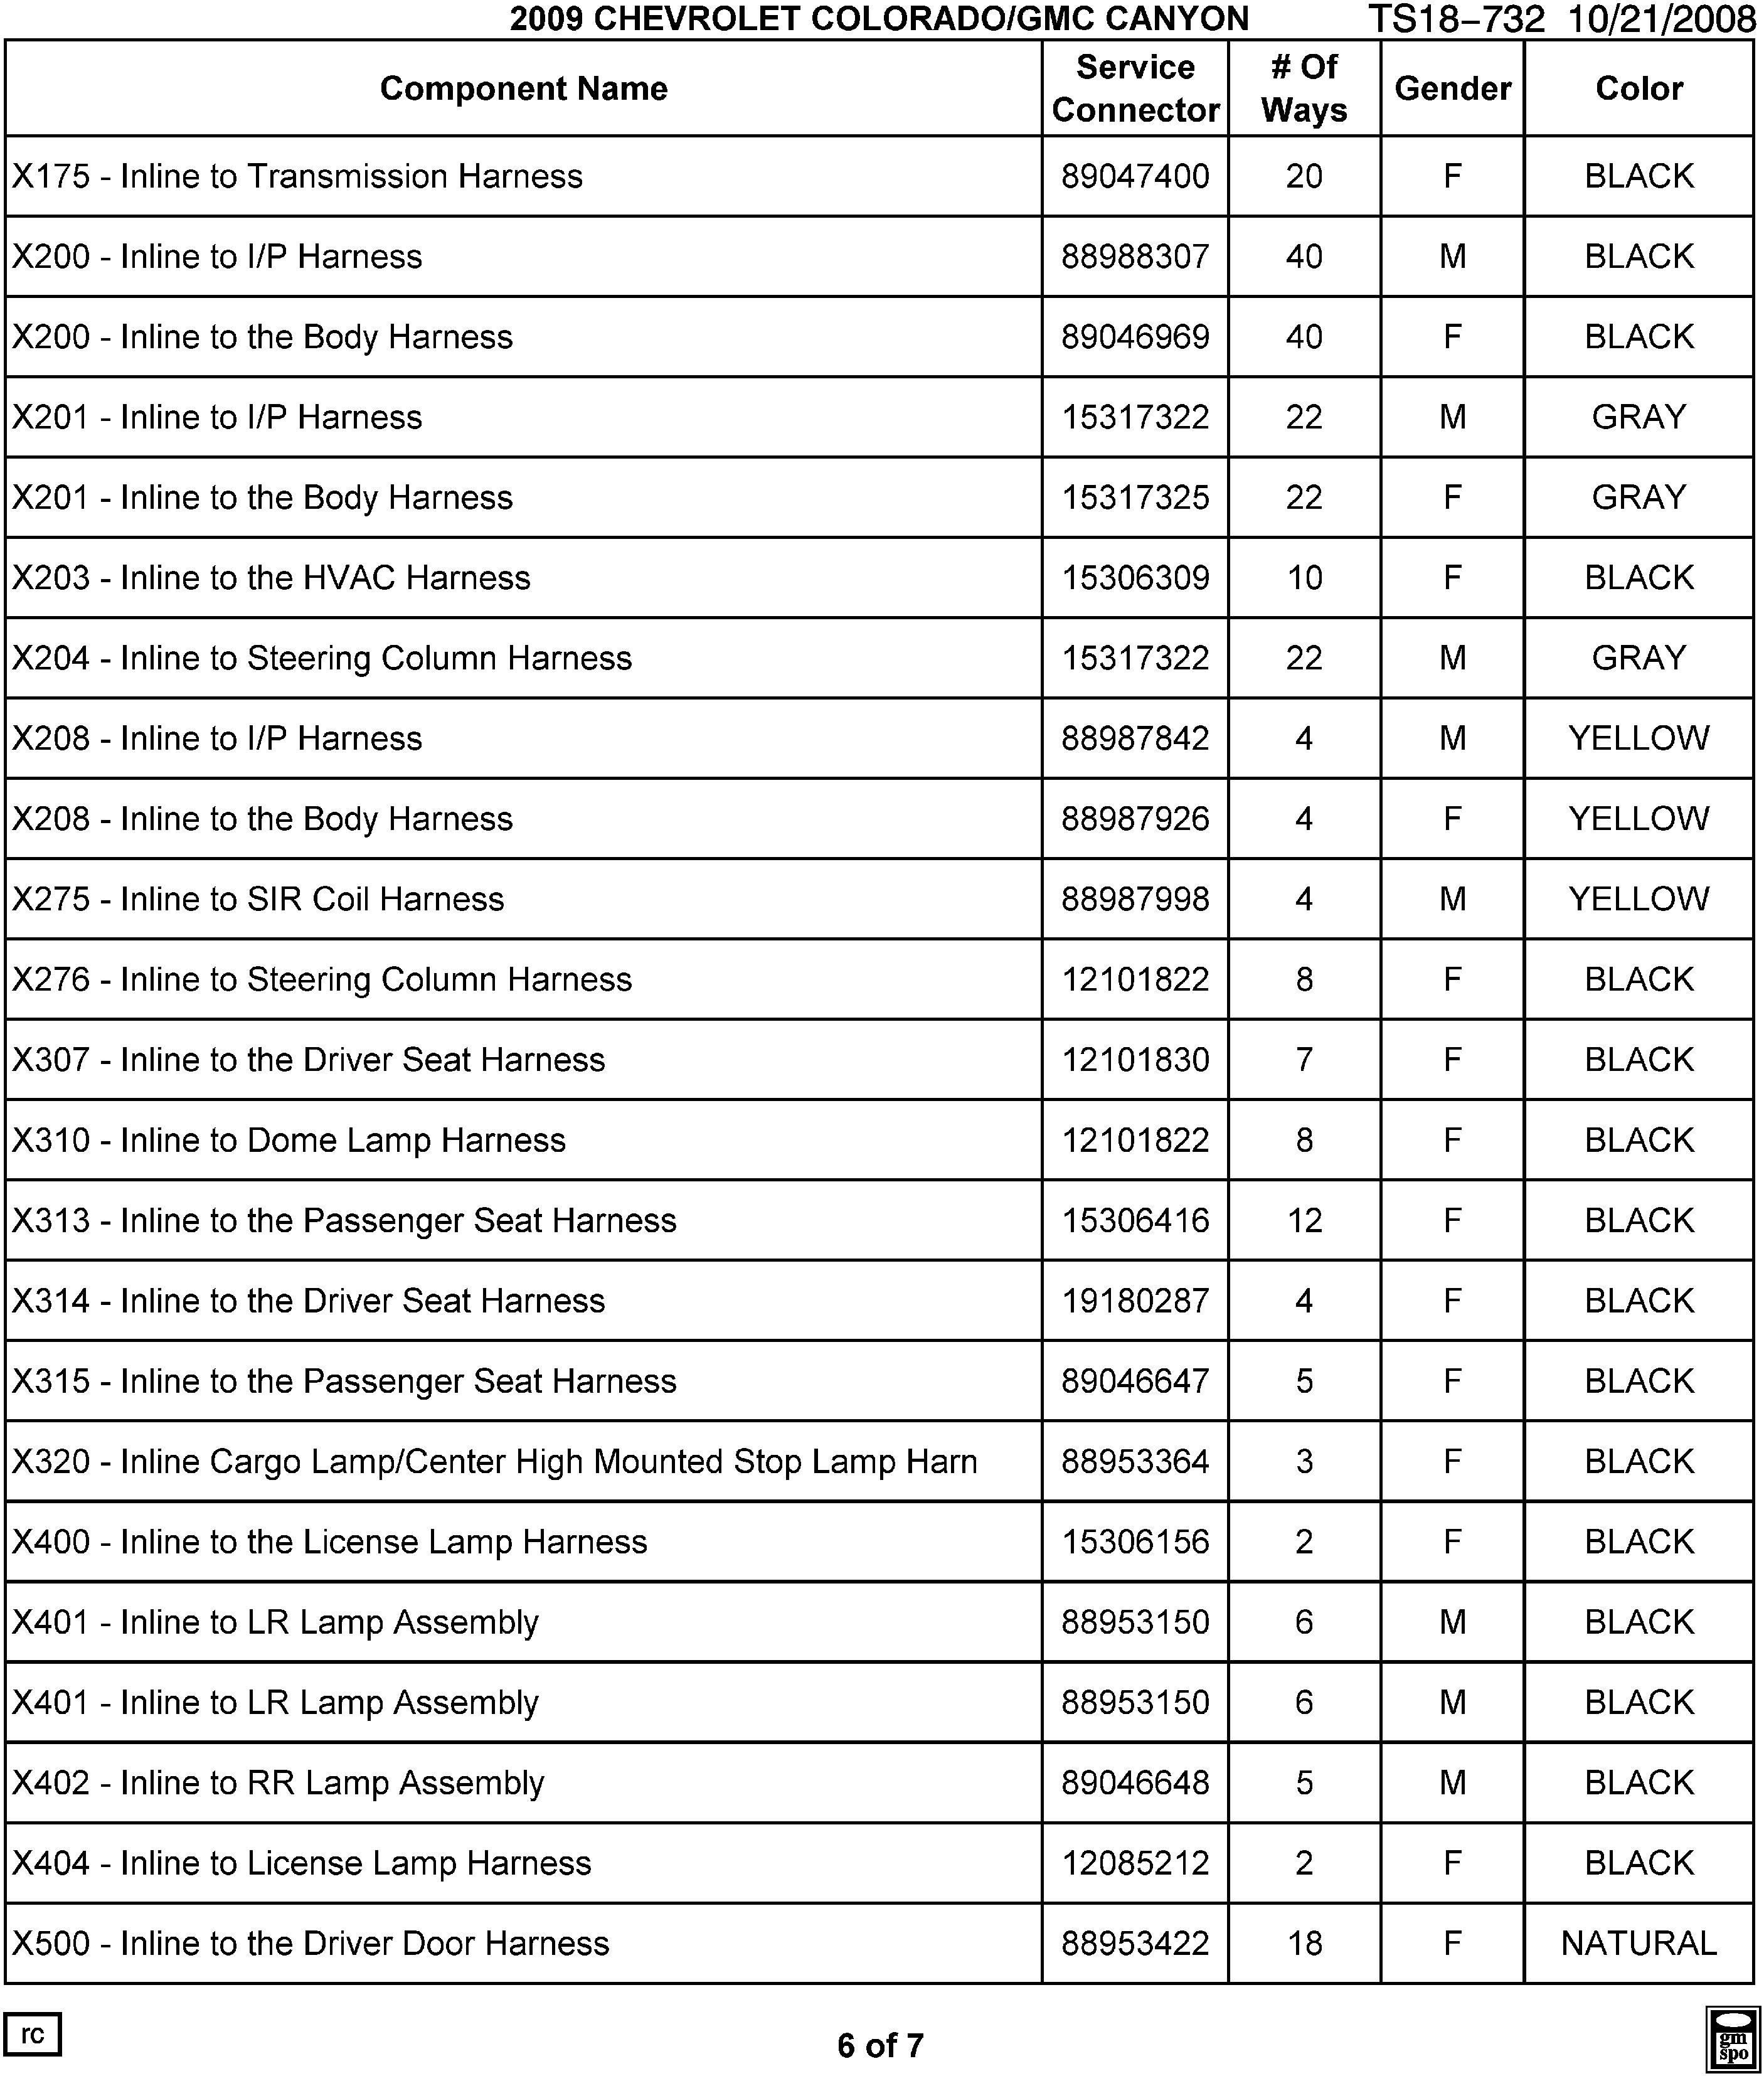 COLORADO SPORT 2WD - Electrical connector list by noun name - x175 ...